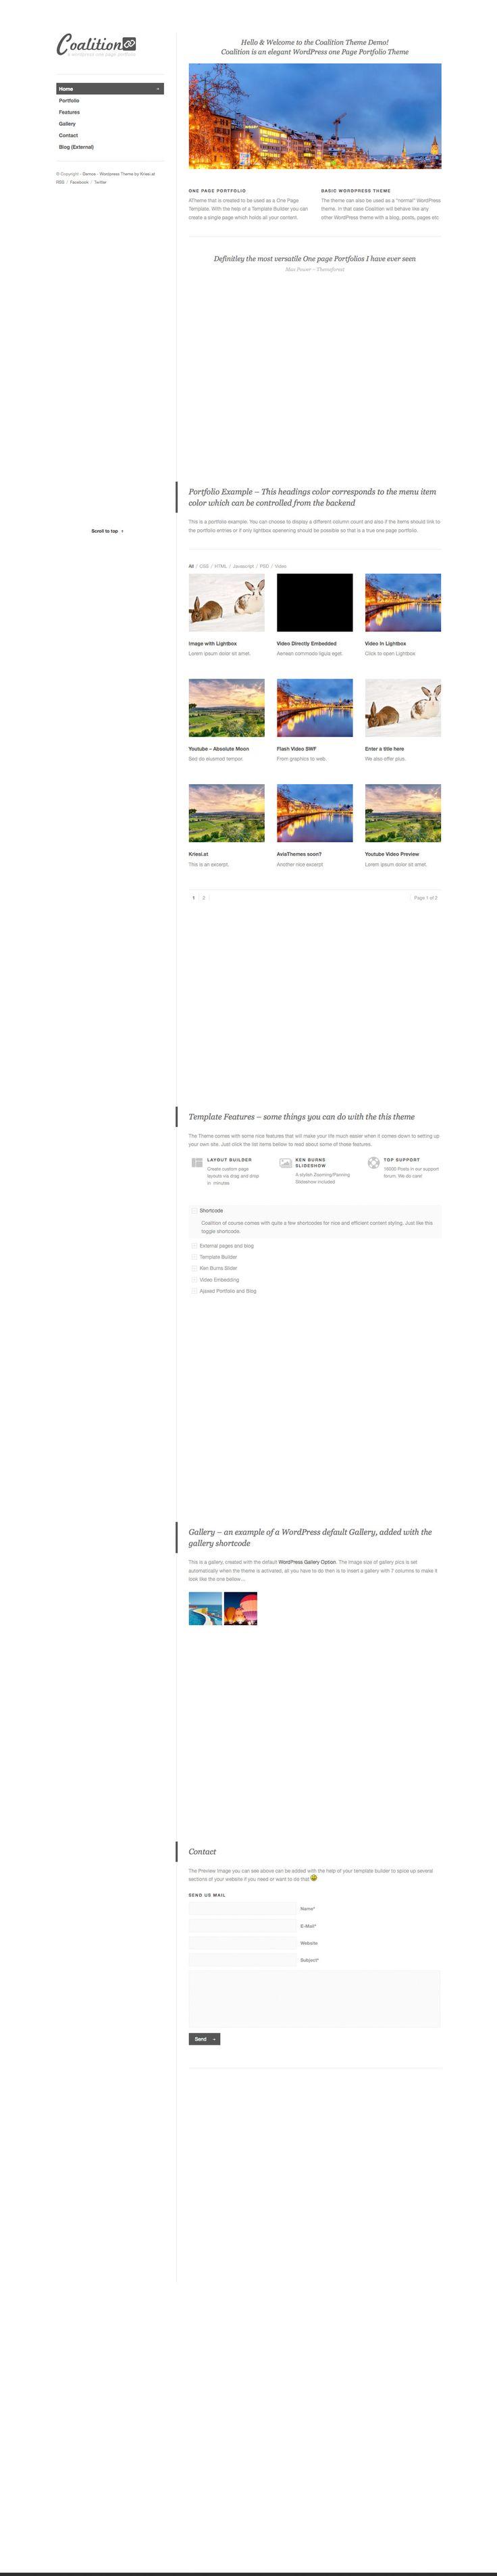 Coalition - a wordpress theme